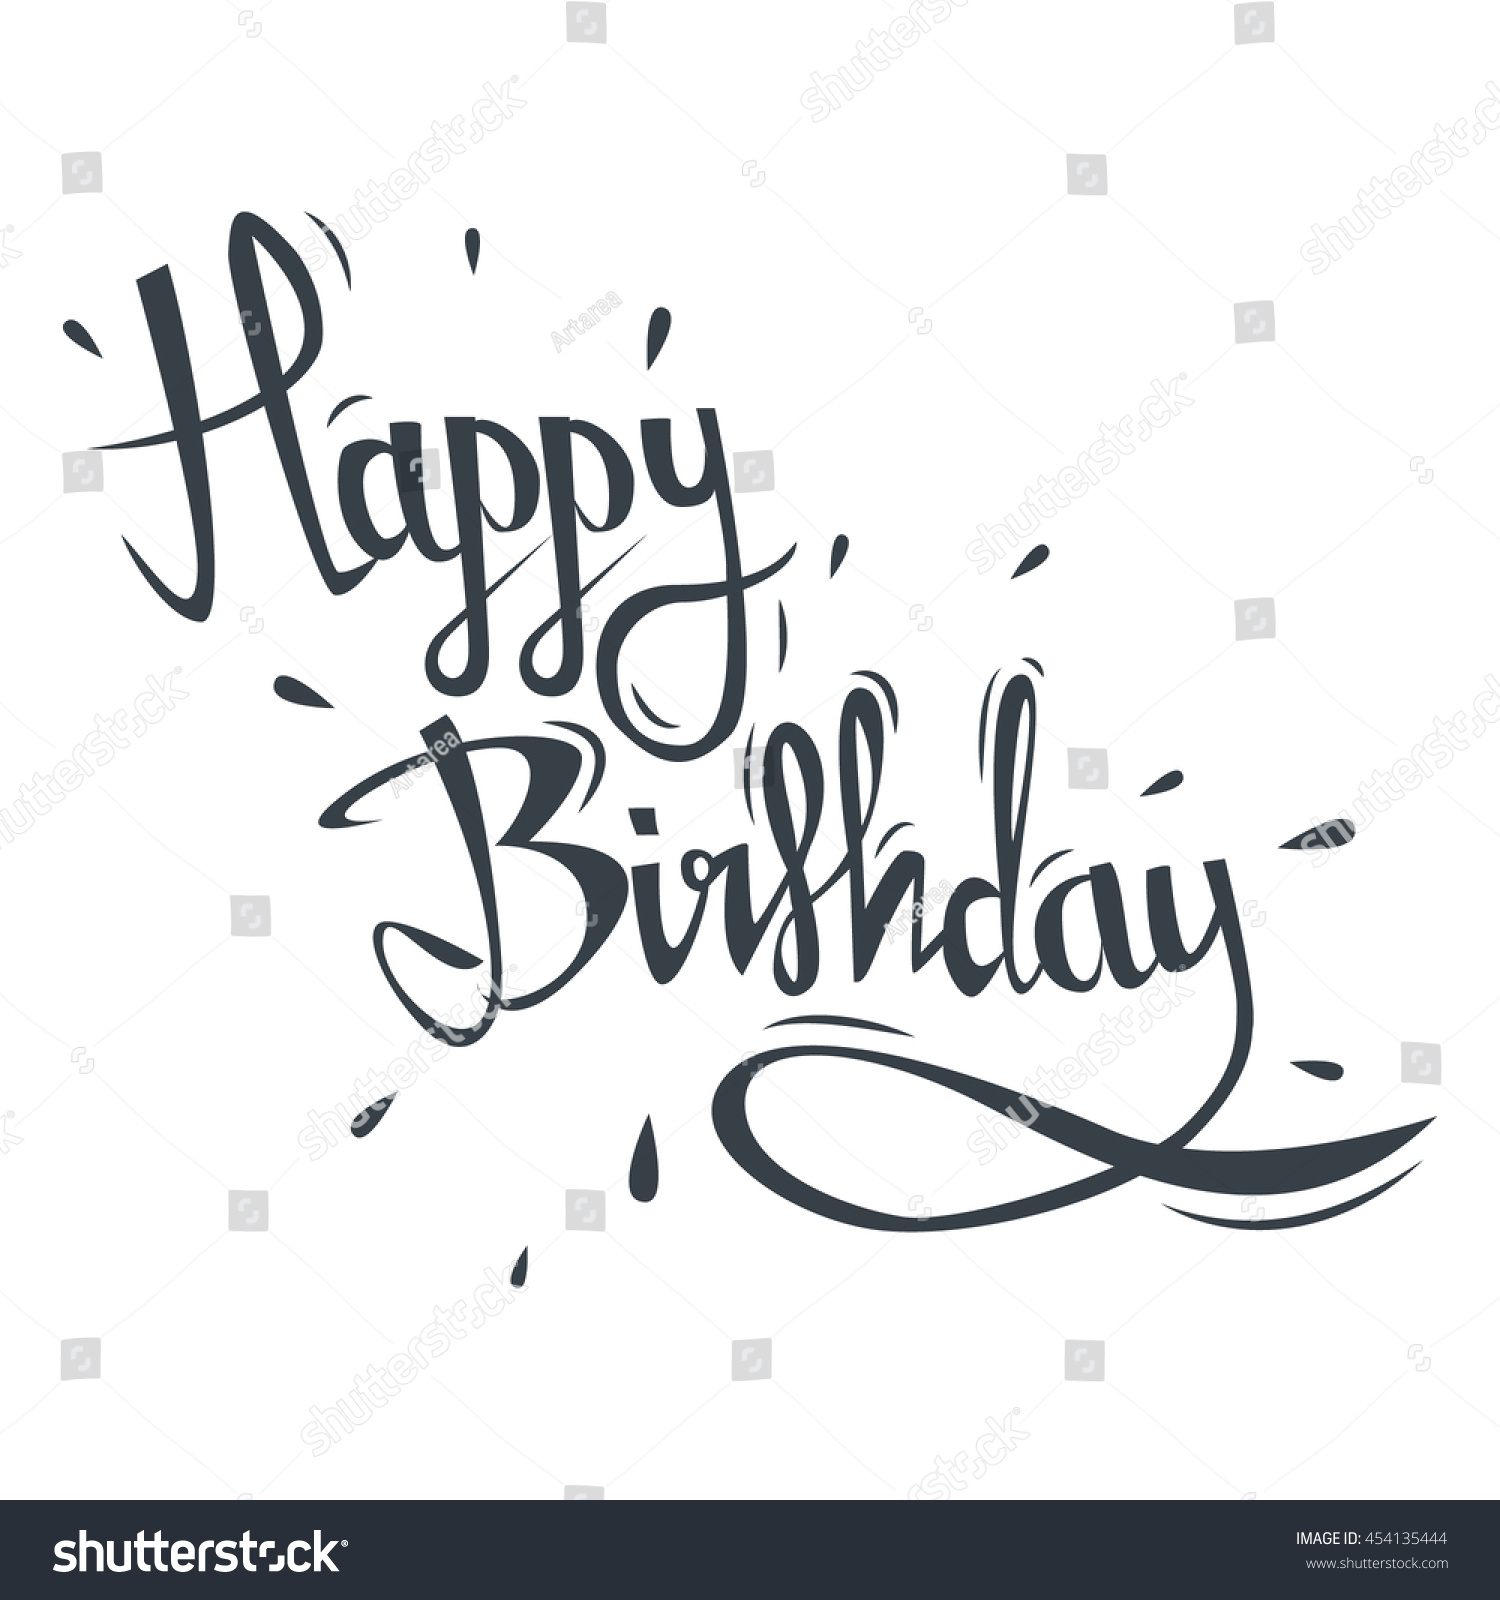 Happy birthday greeting card hand drawn stock vector